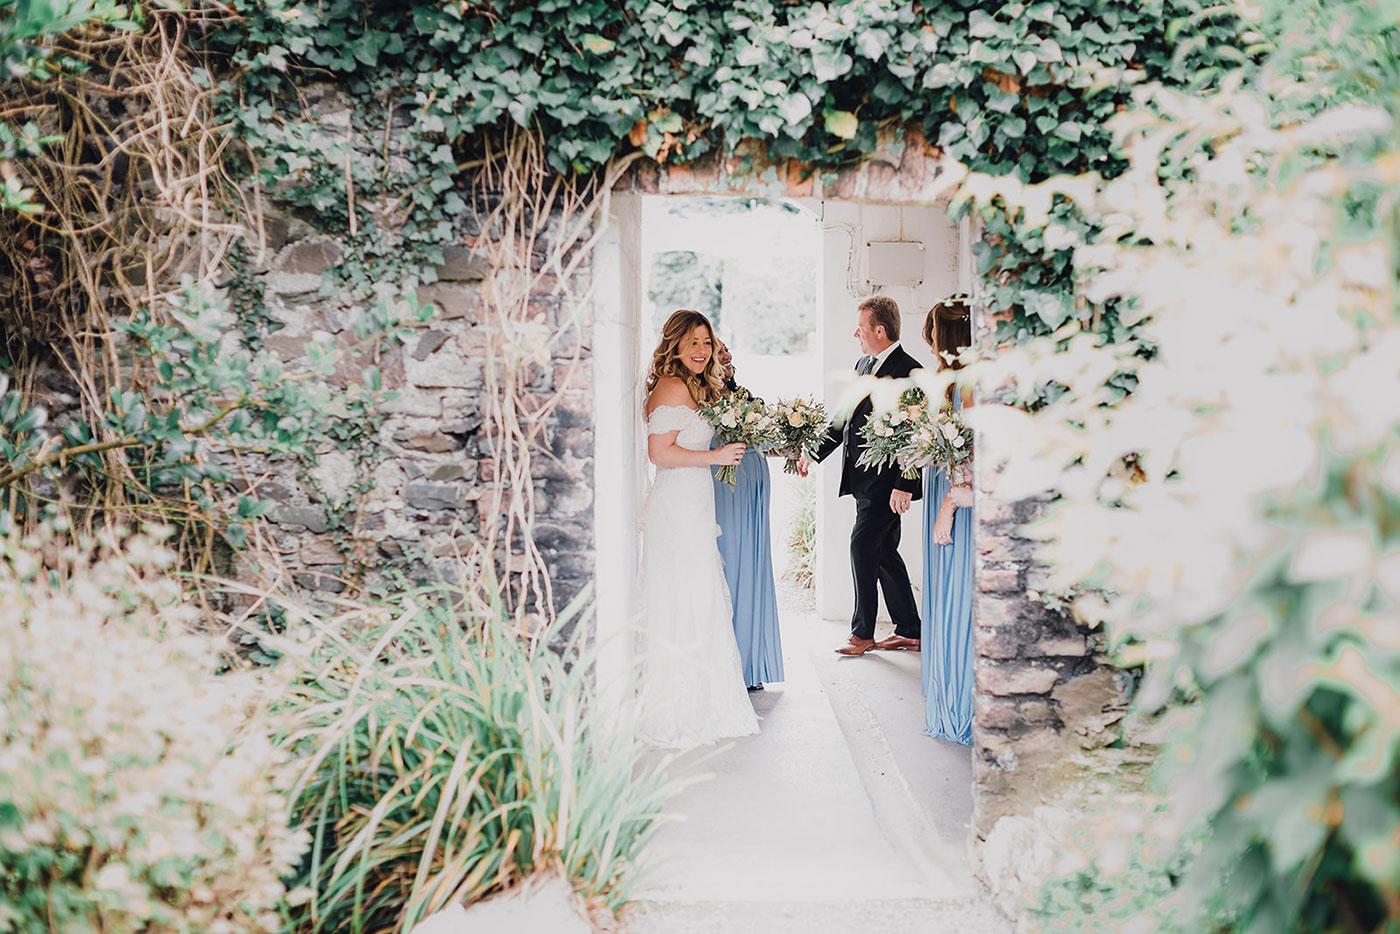 Wedding at Rathsallagh House